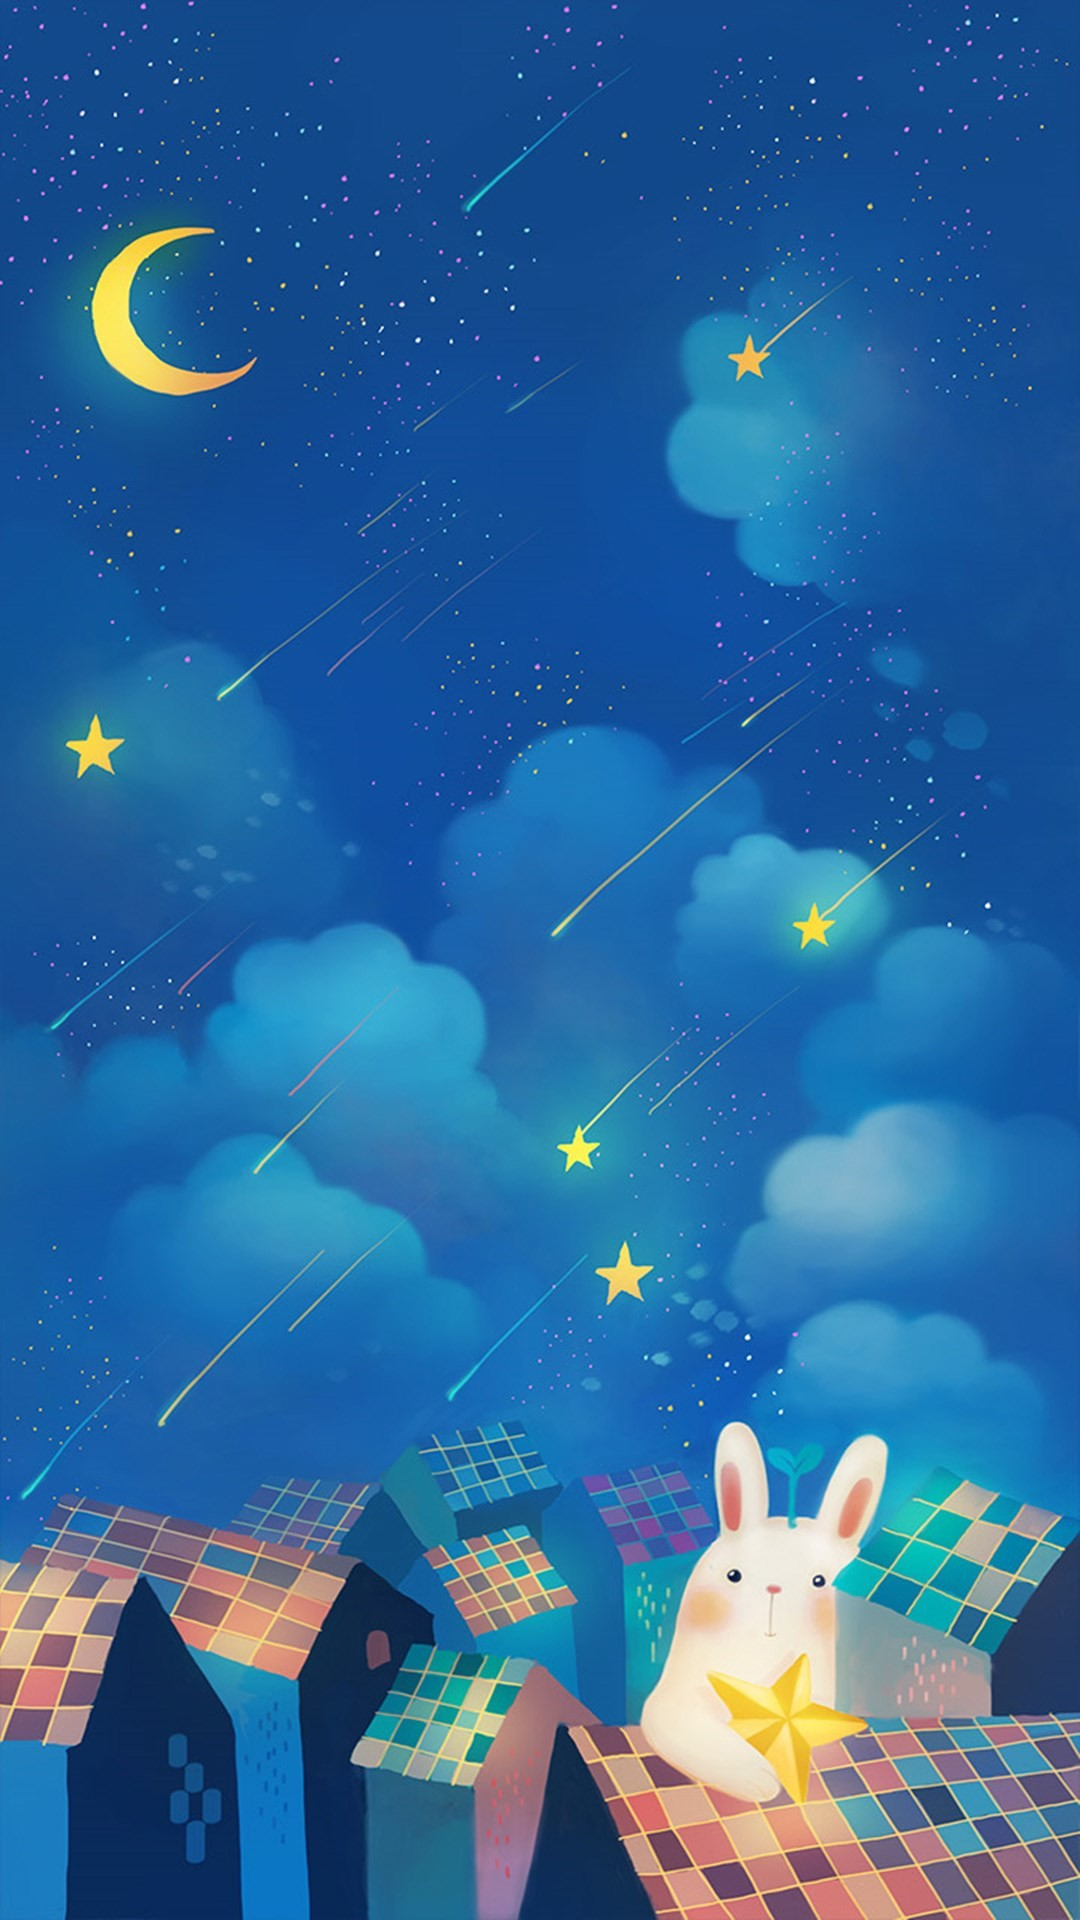 <b>Romantic Night Moon Star Clouds Sky Rabbit House Top wallpaper</b